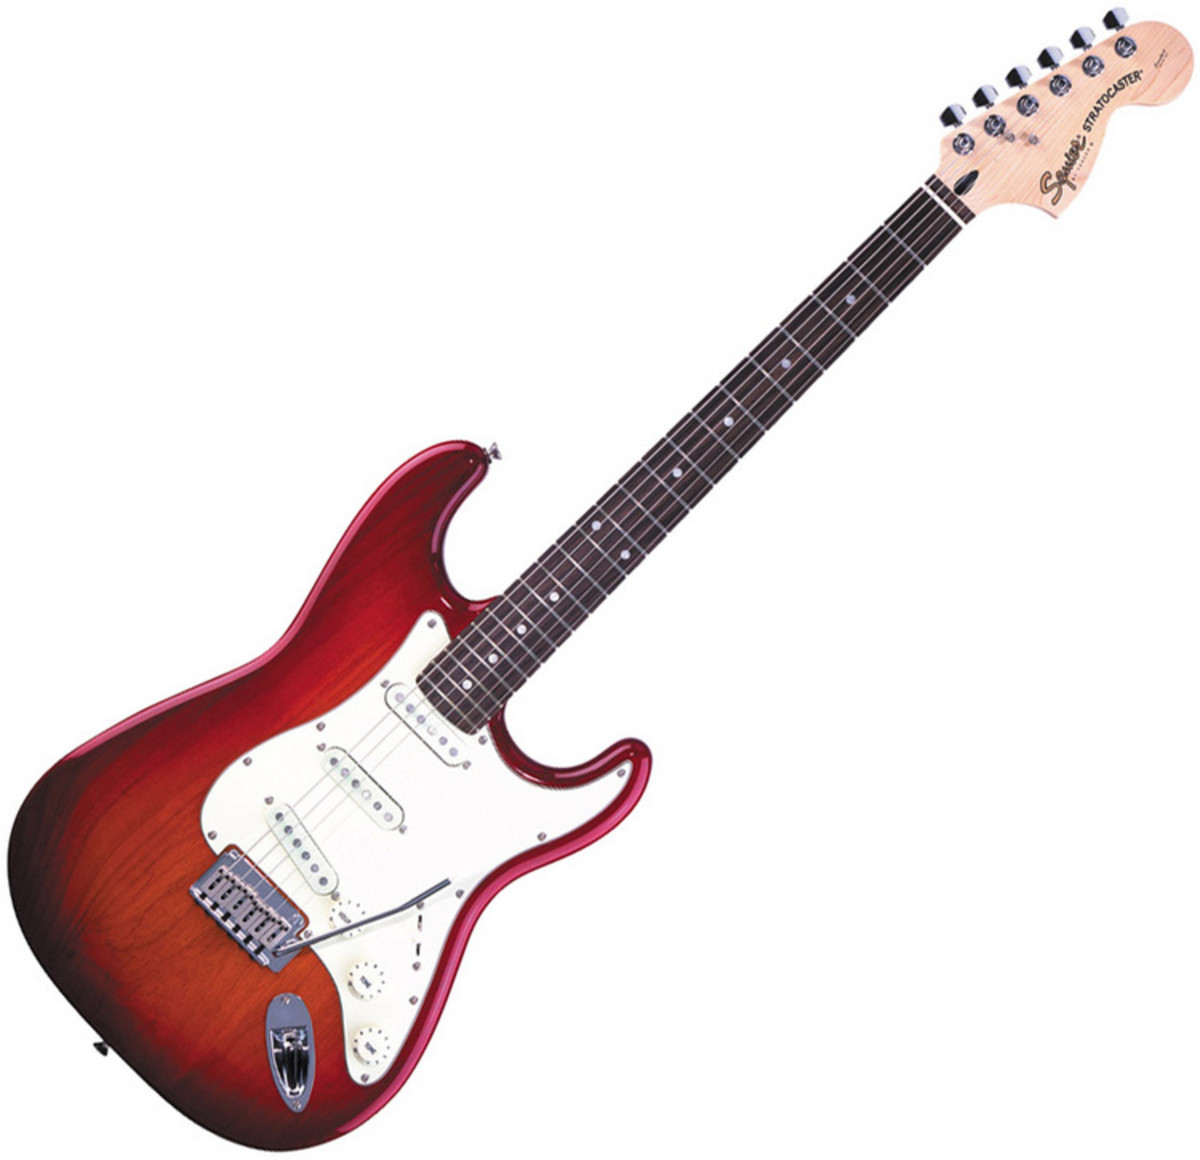 squier by fender standard stratocaster guitar cherry sunburst at gear4music. Black Bedroom Furniture Sets. Home Design Ideas